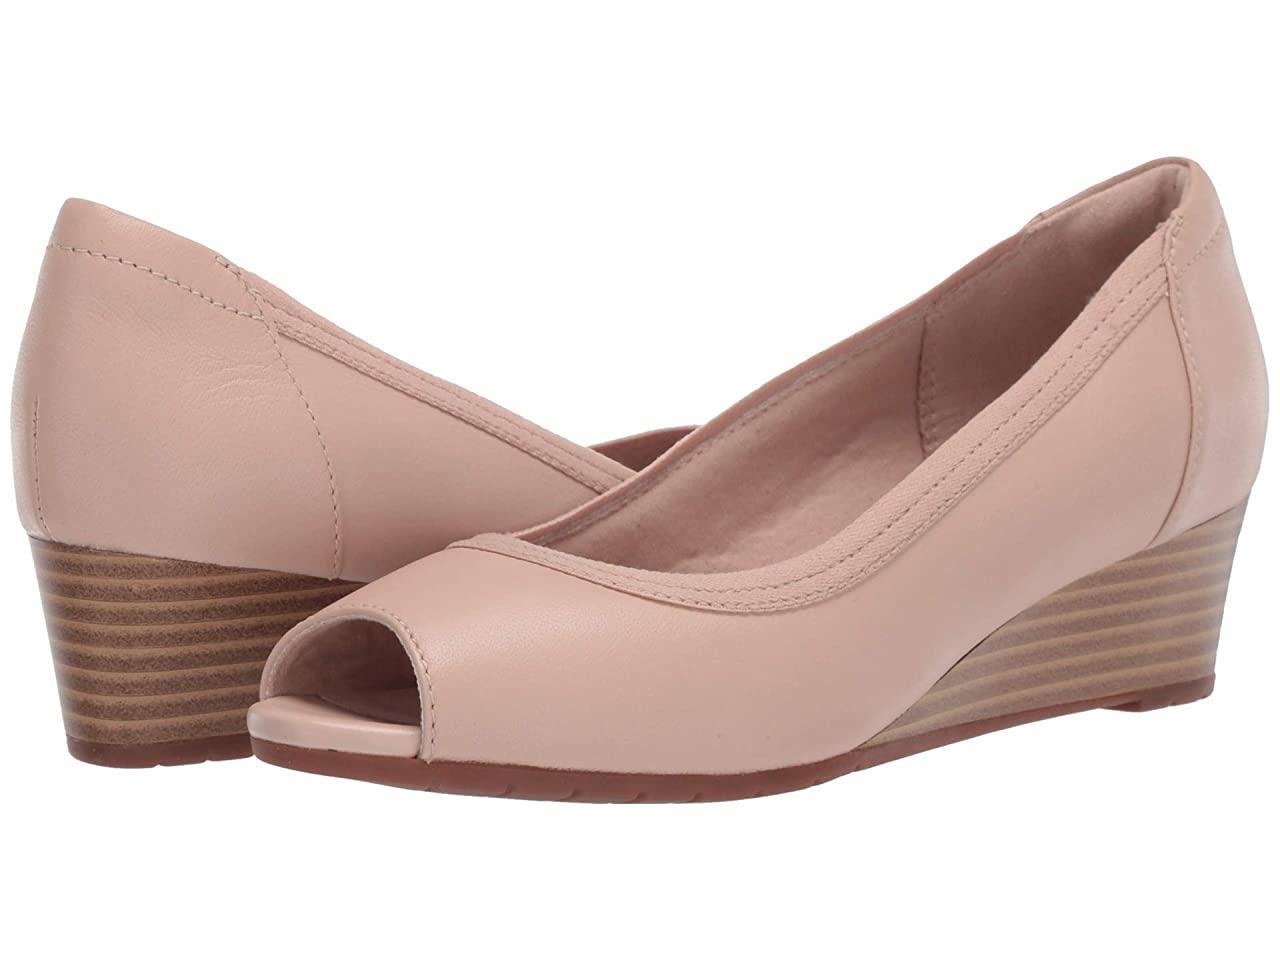 Туфли на каблуке (Оригинал) Clarks Mallory Charm Blush Leather